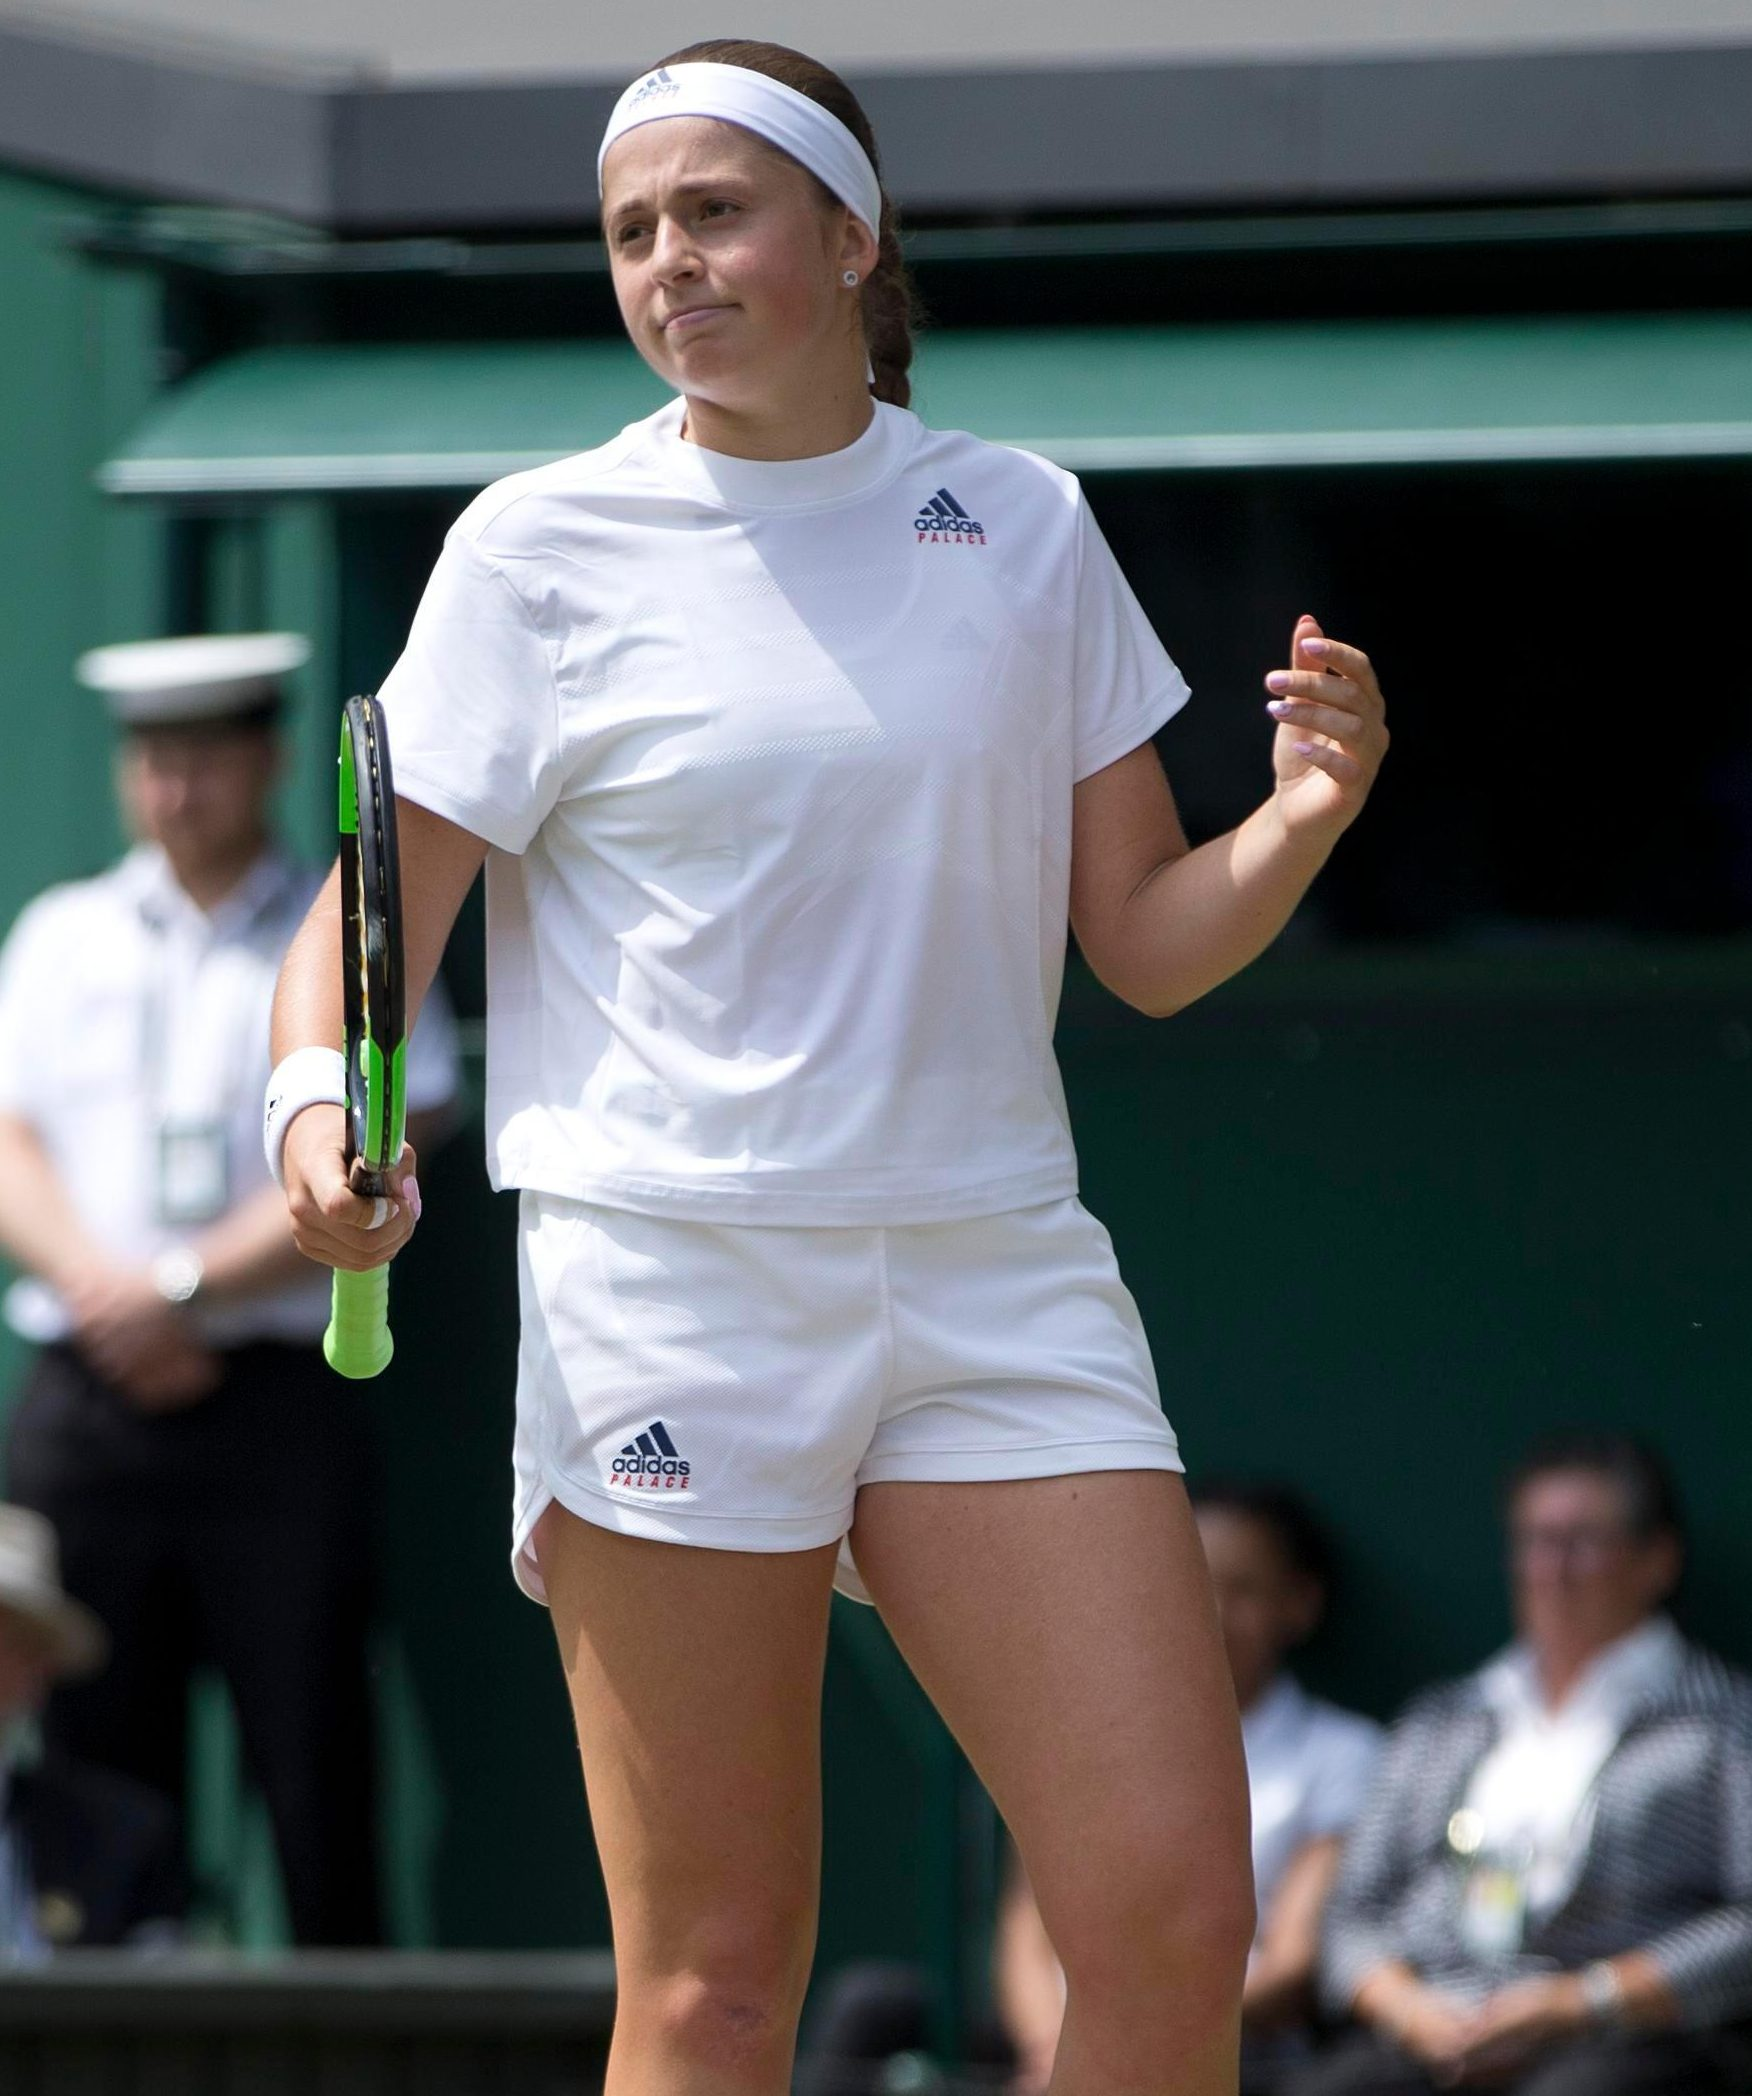 Jelena Ostapenko could not overcome her opponent